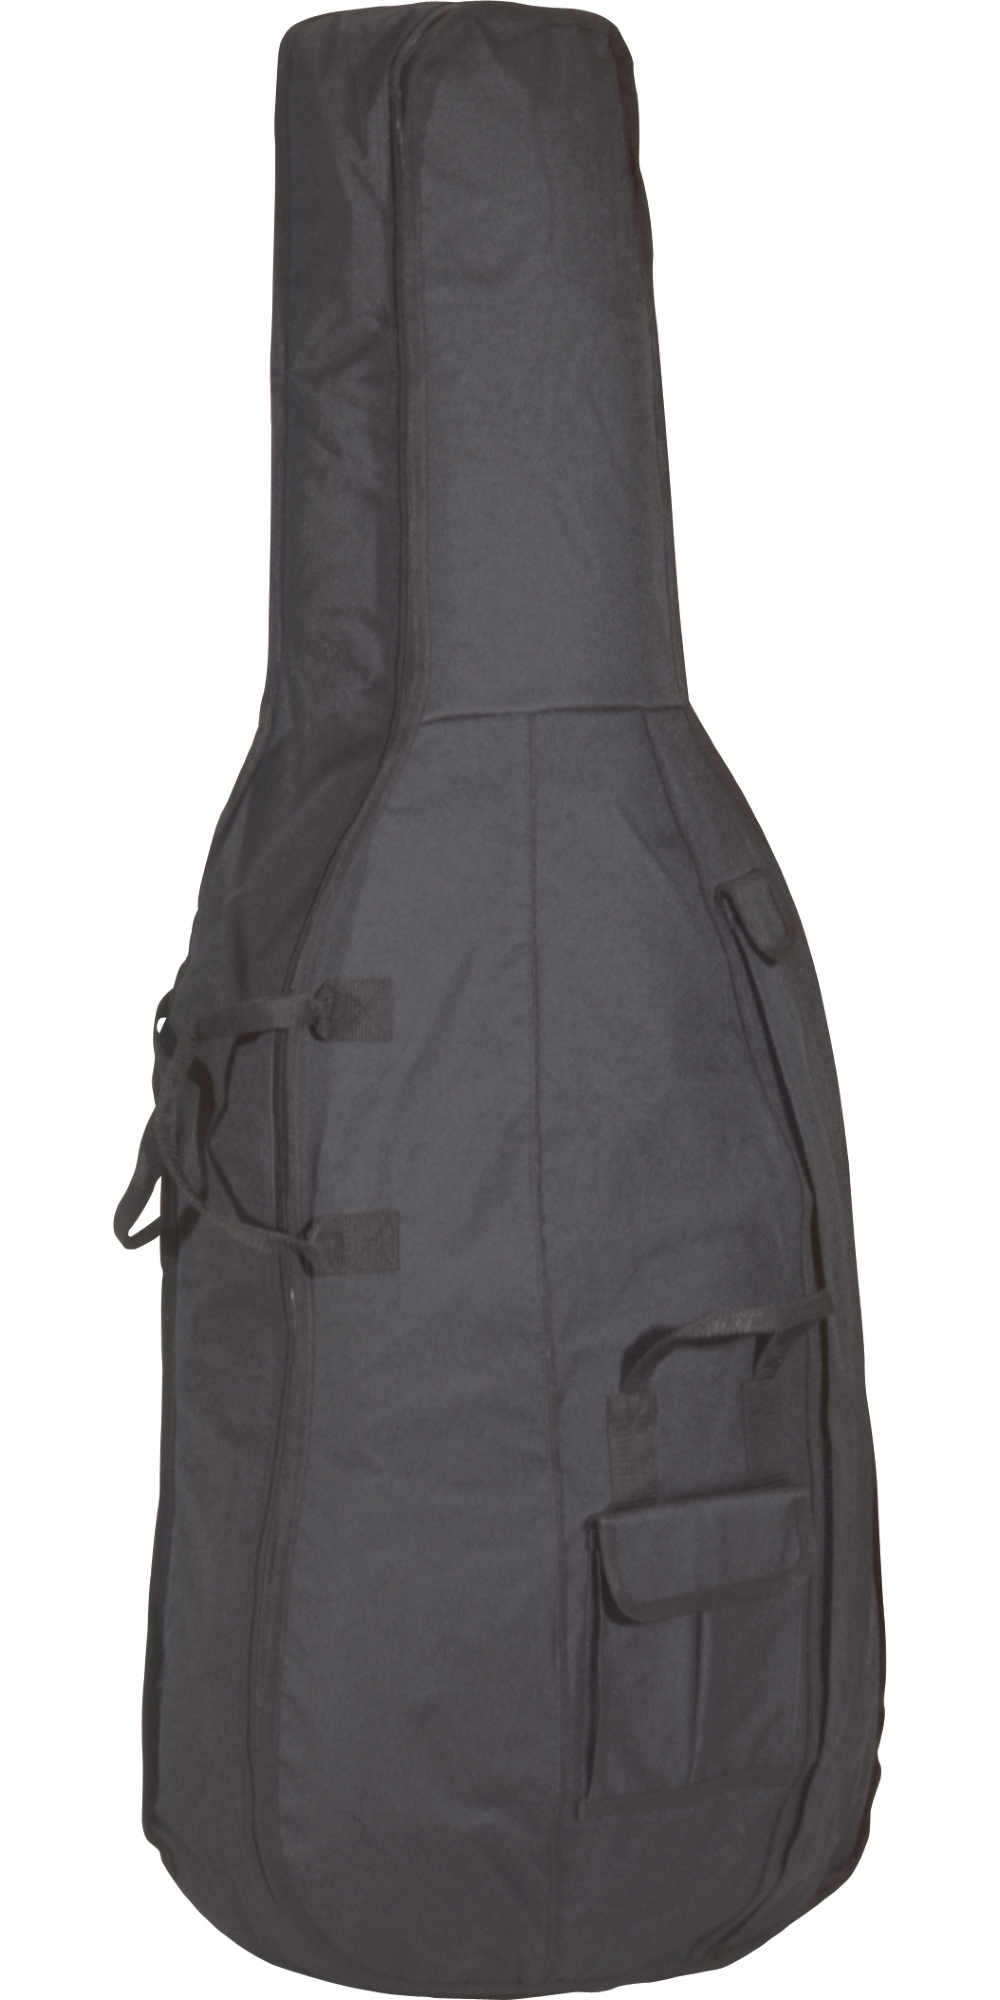 Harvard Padded Cello Bag by Bellafina